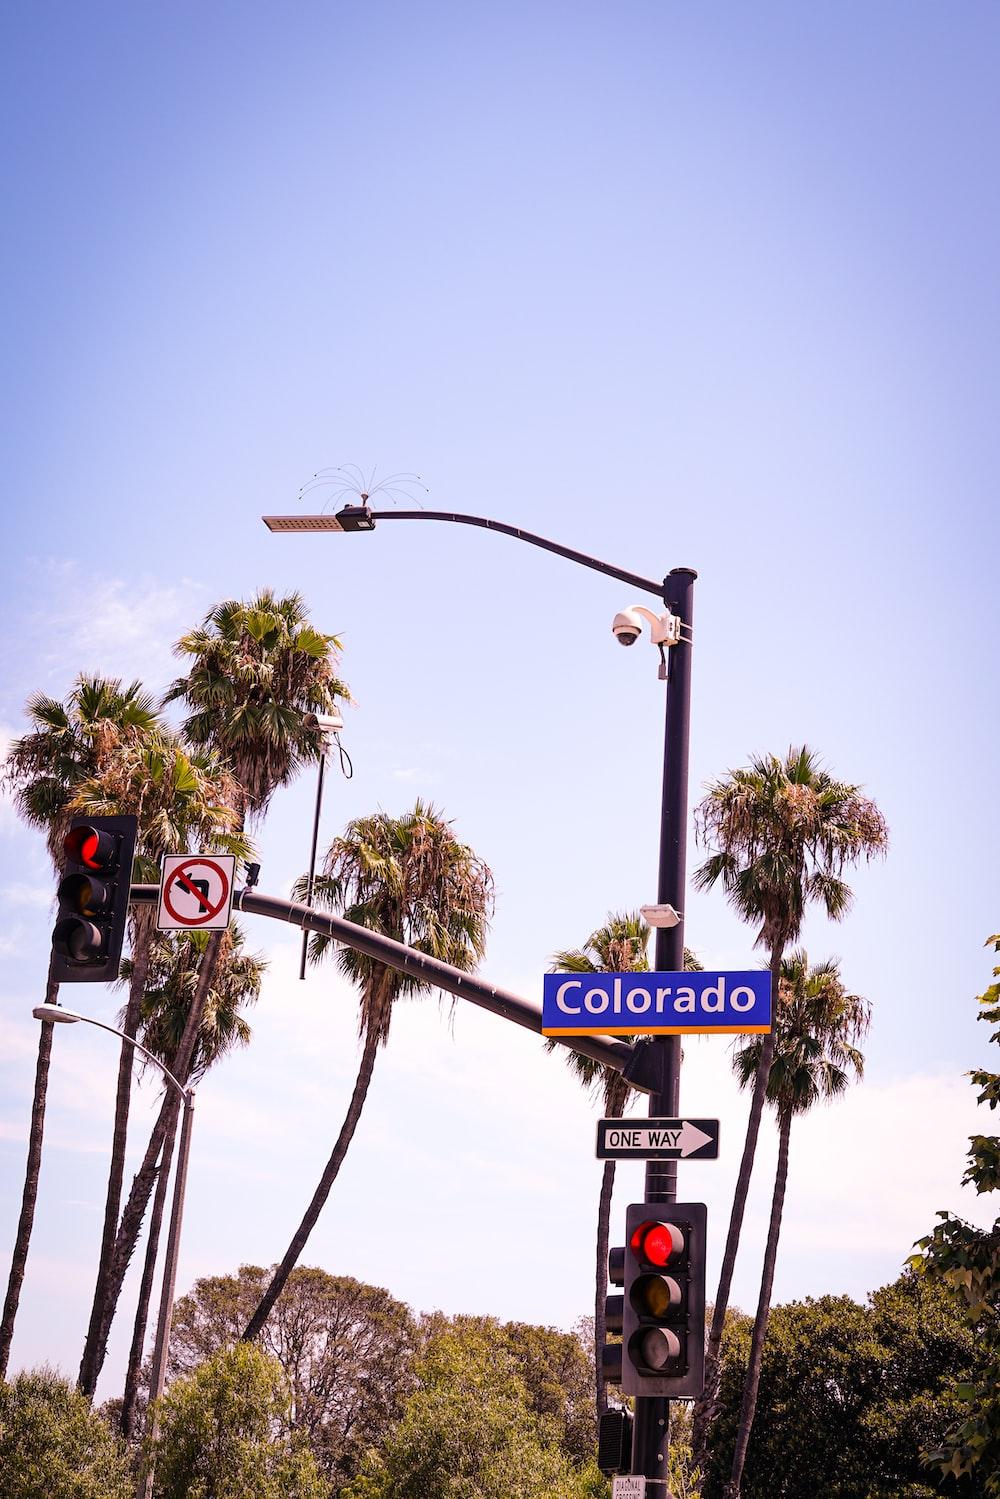 blue Colorado signboard under traffic light